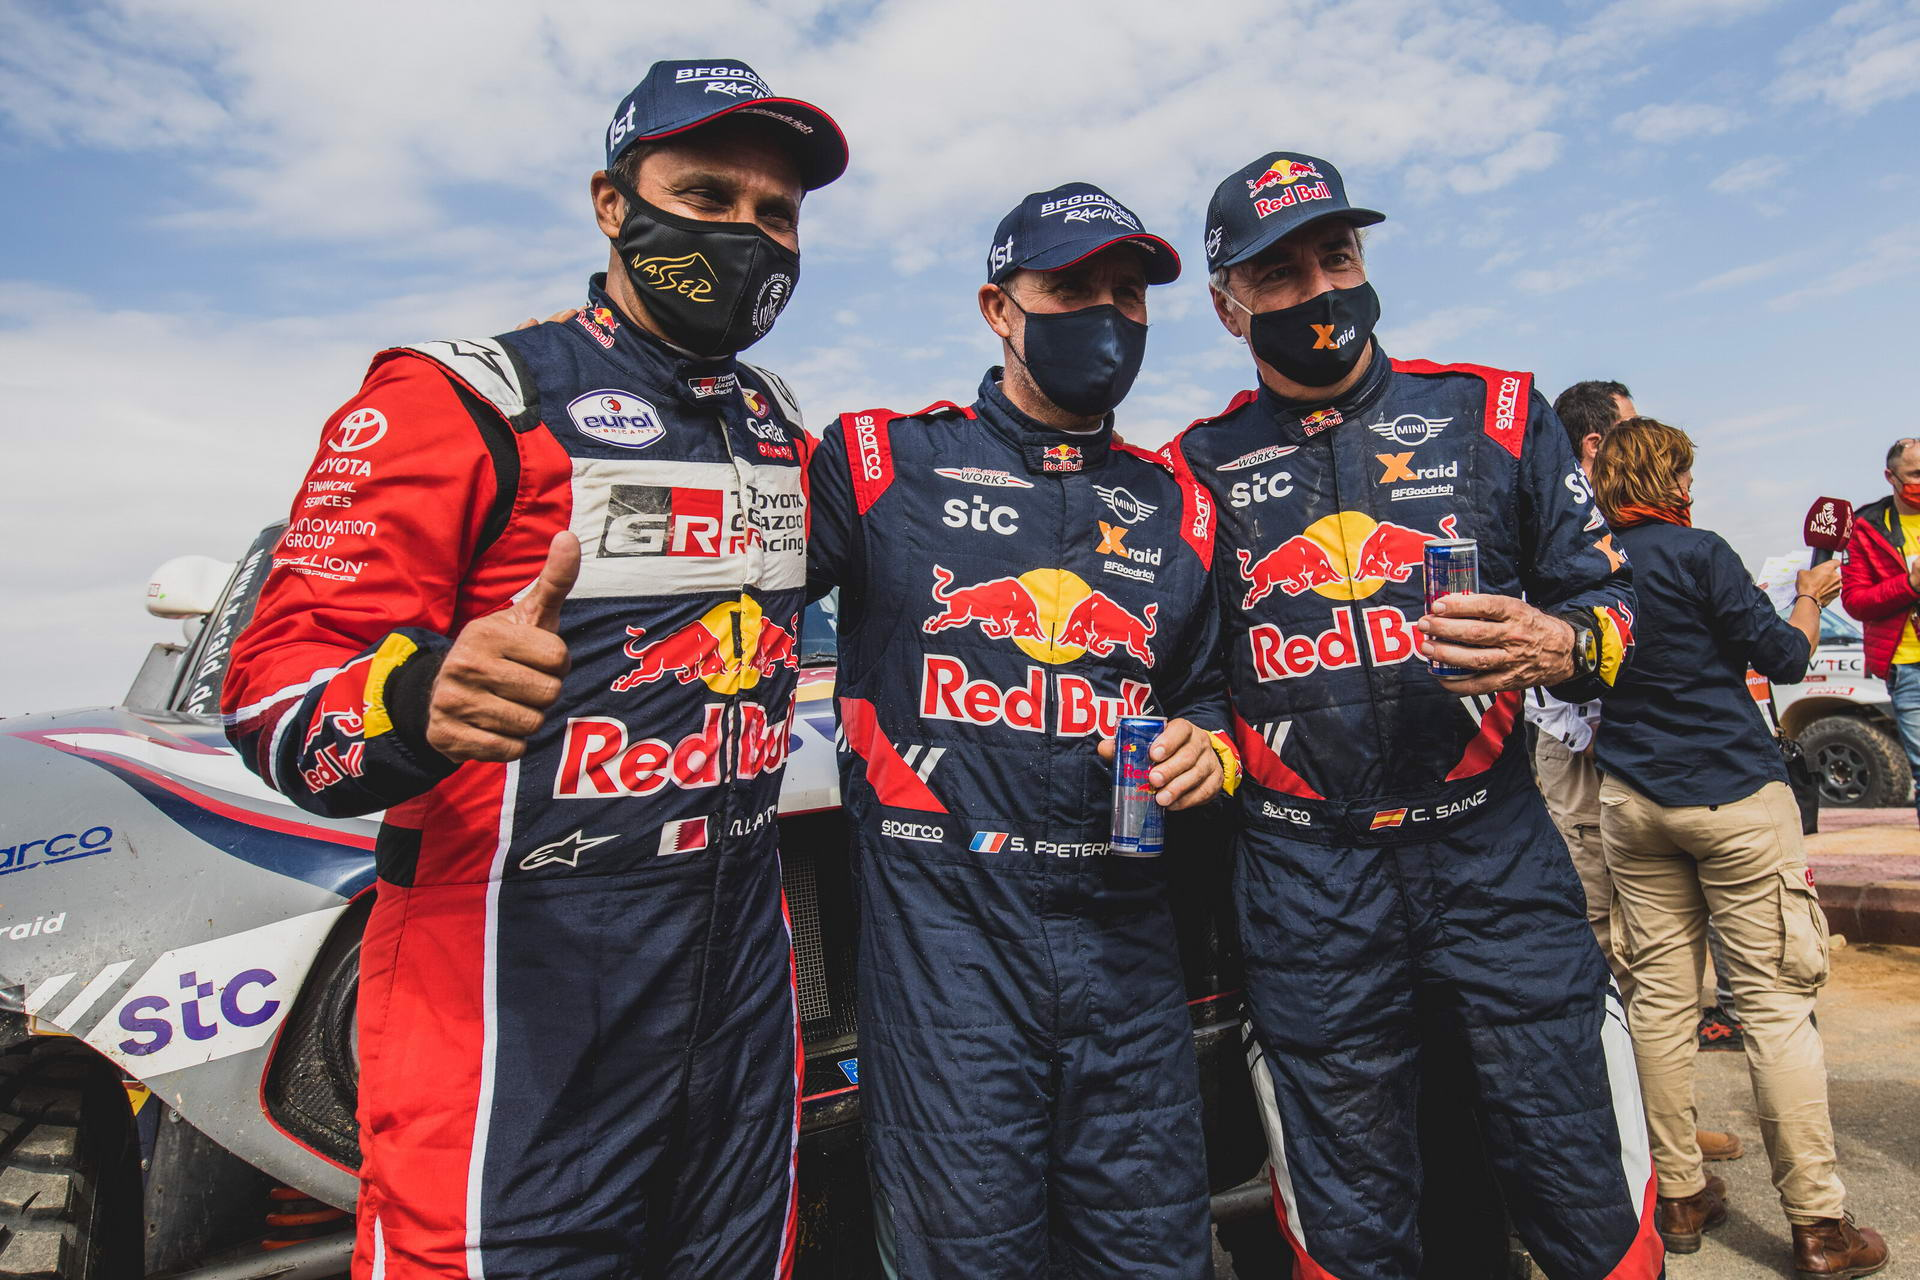 Dakar Top 3 Cars